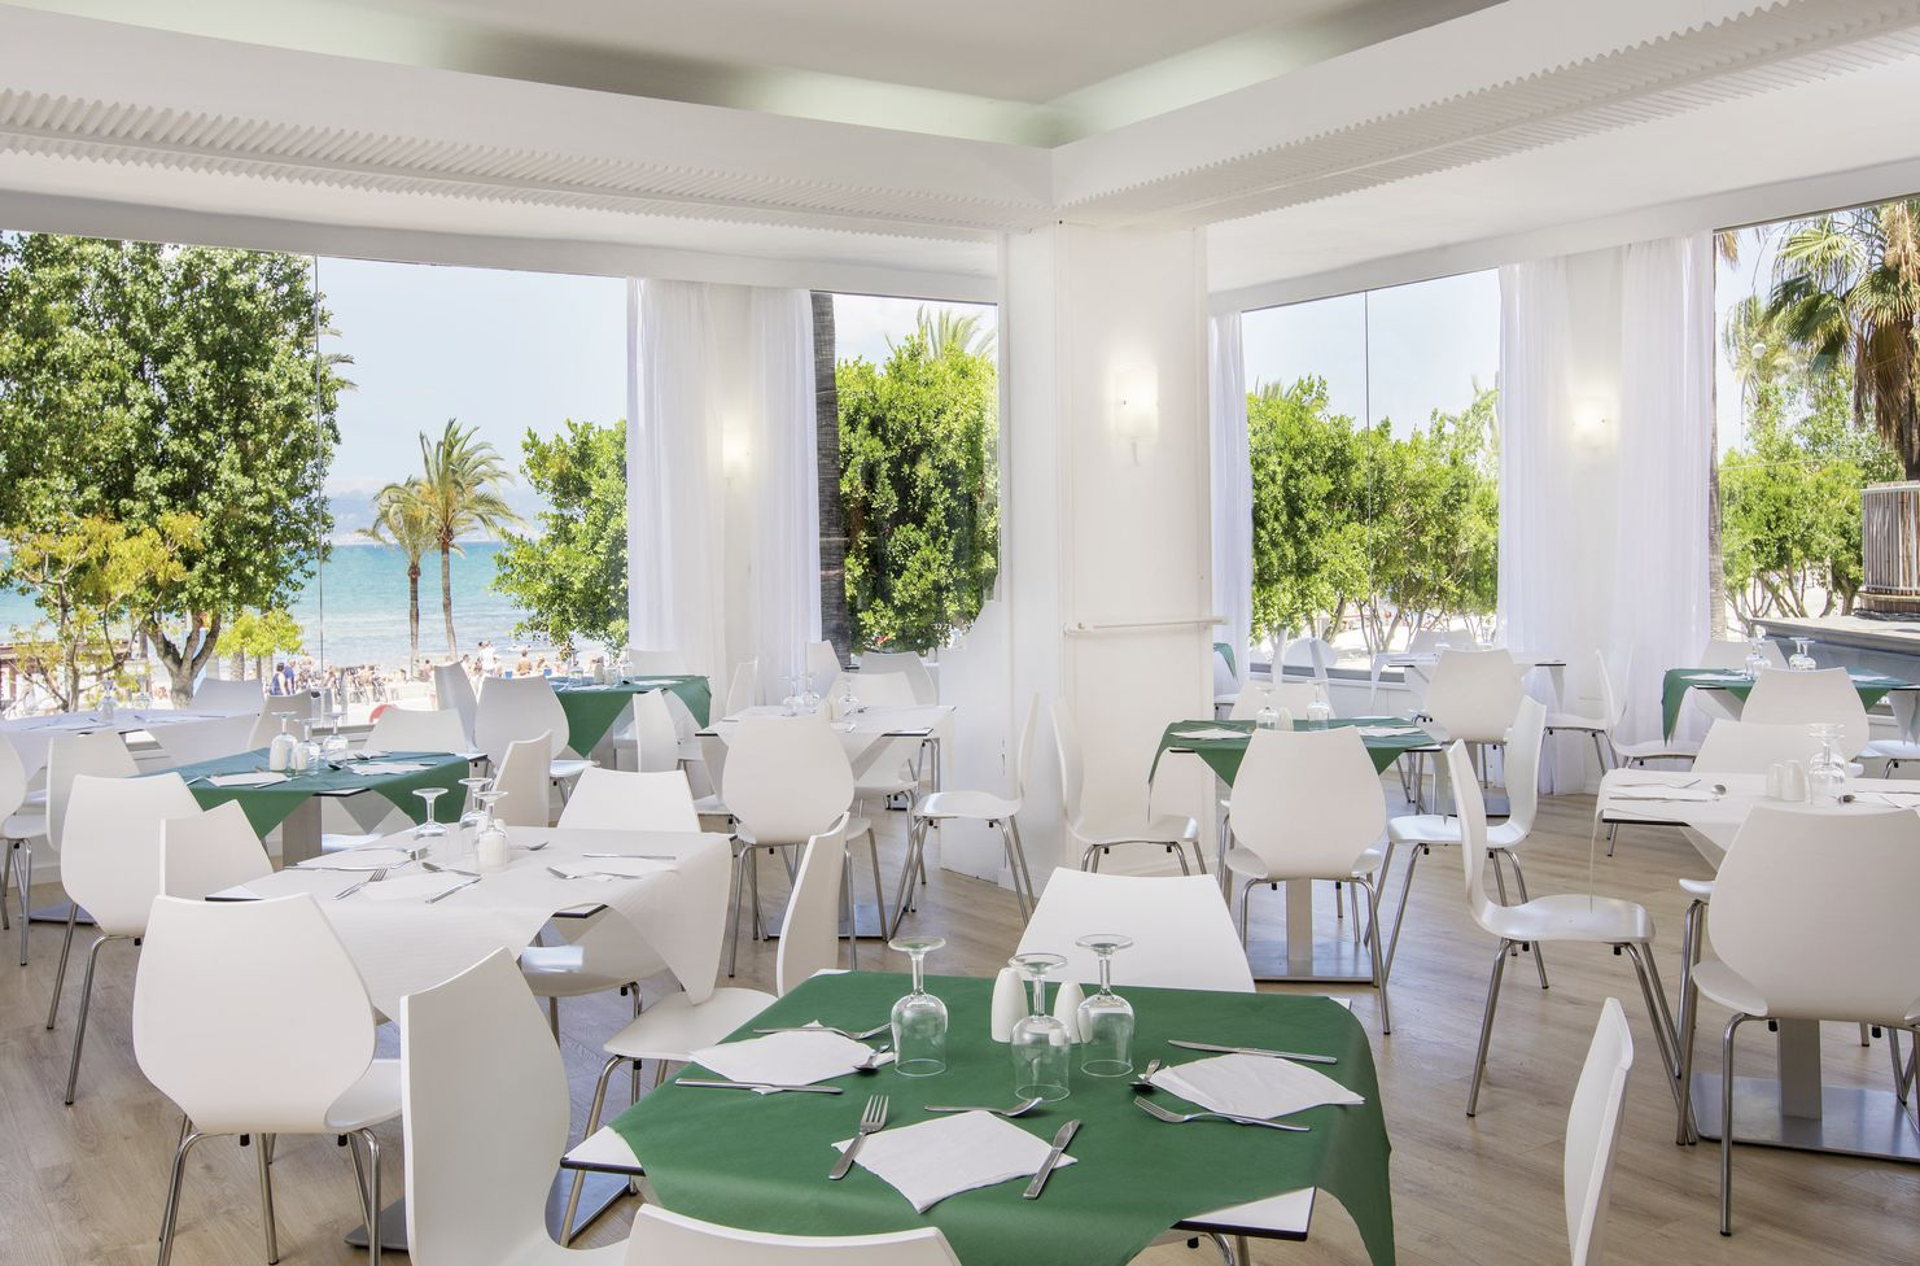 Hôtel whala beach 3*